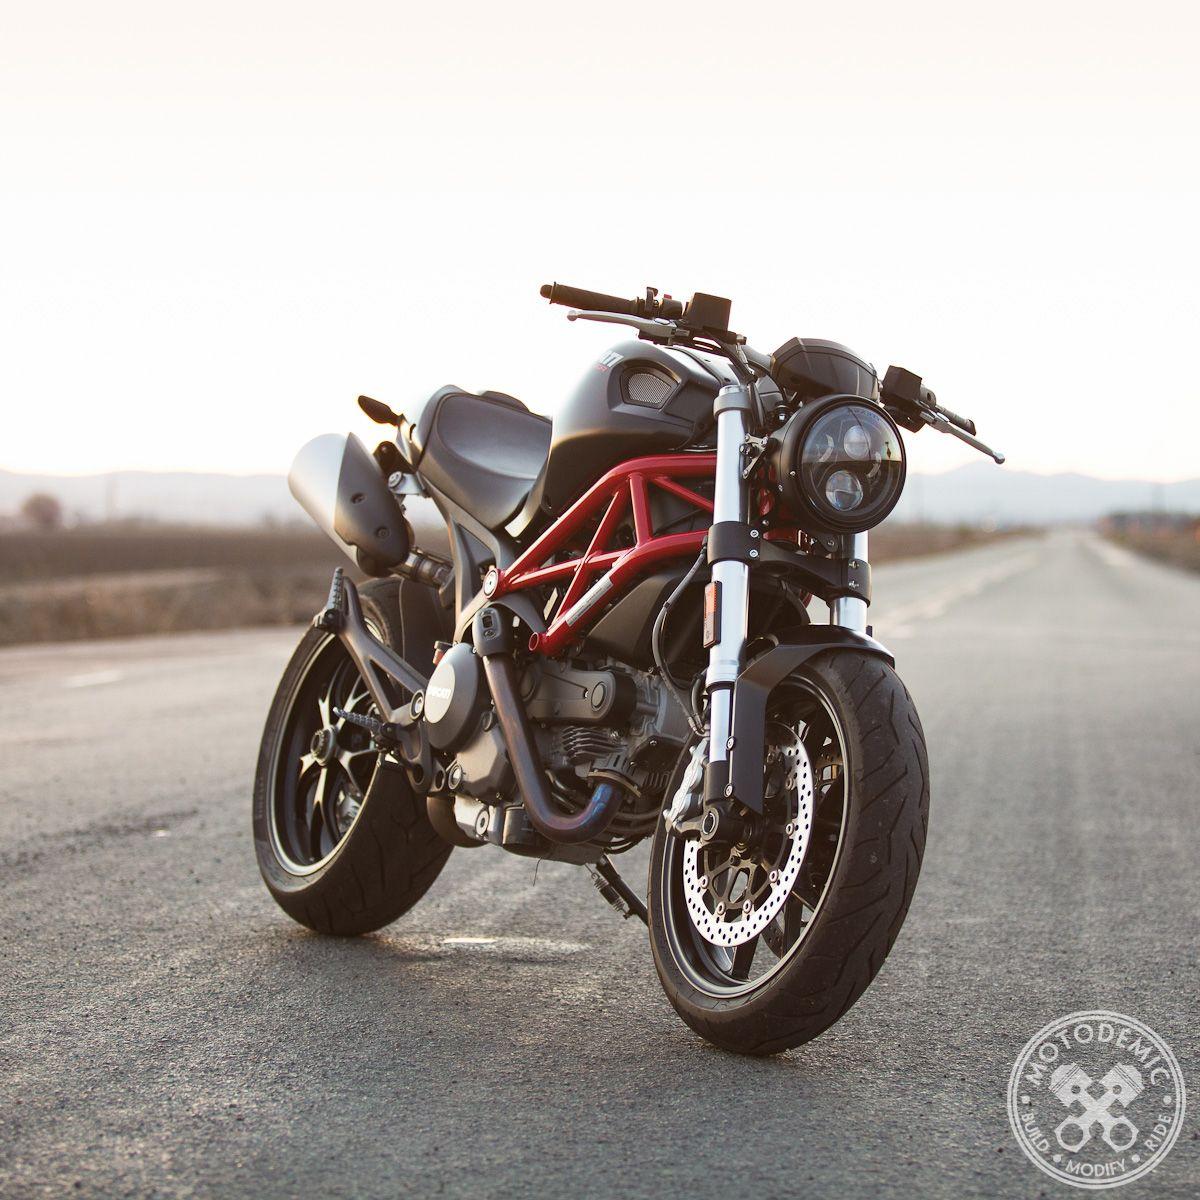 Ducati Monster Headlight Conversion 6967961100 Moto Ducati